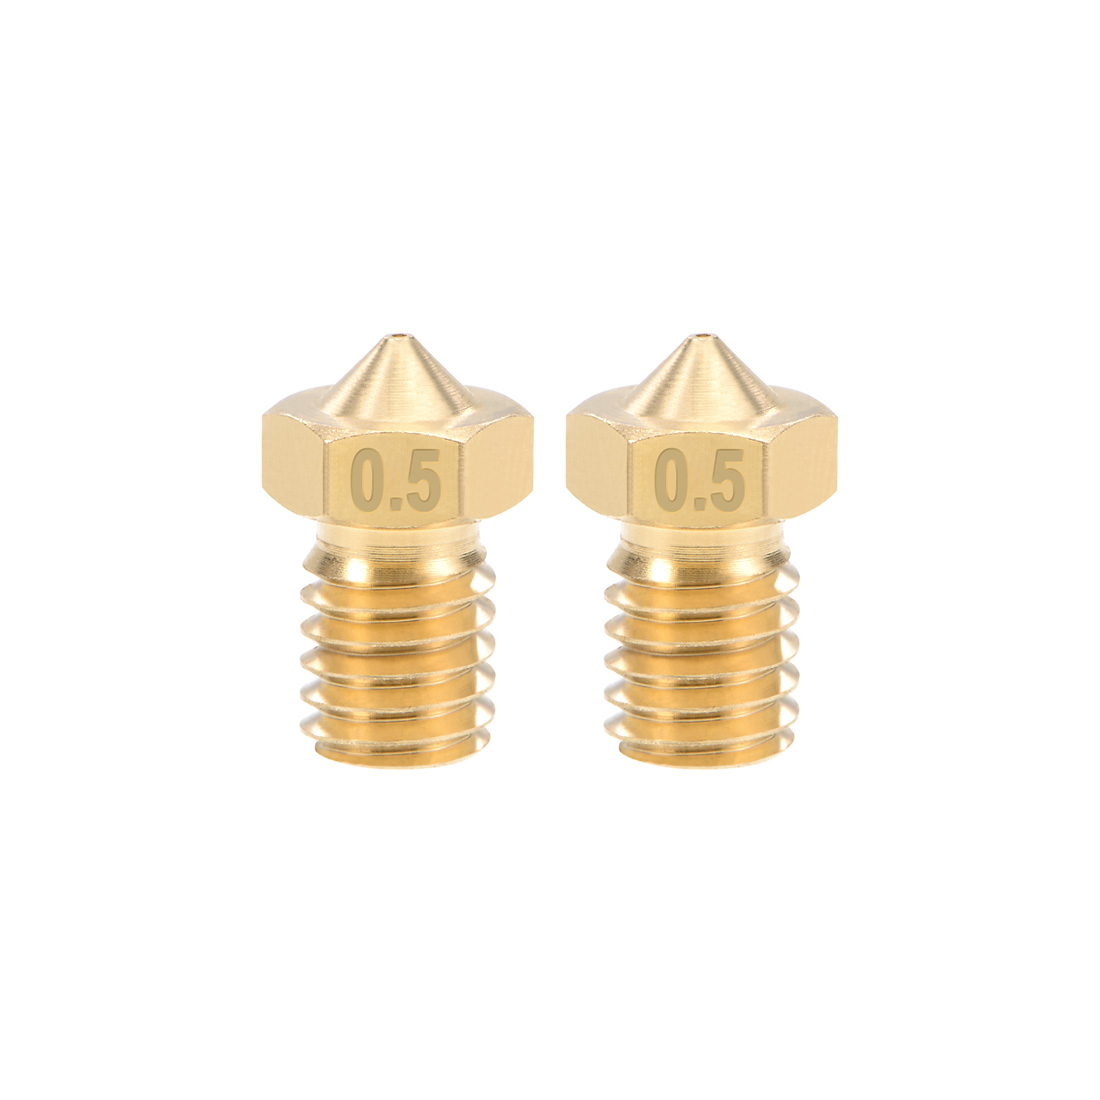 0.5mm 3D Printer Nozzle Head M6 Thread V5 V6 1.75mm Extruder Print Brass 2pcs